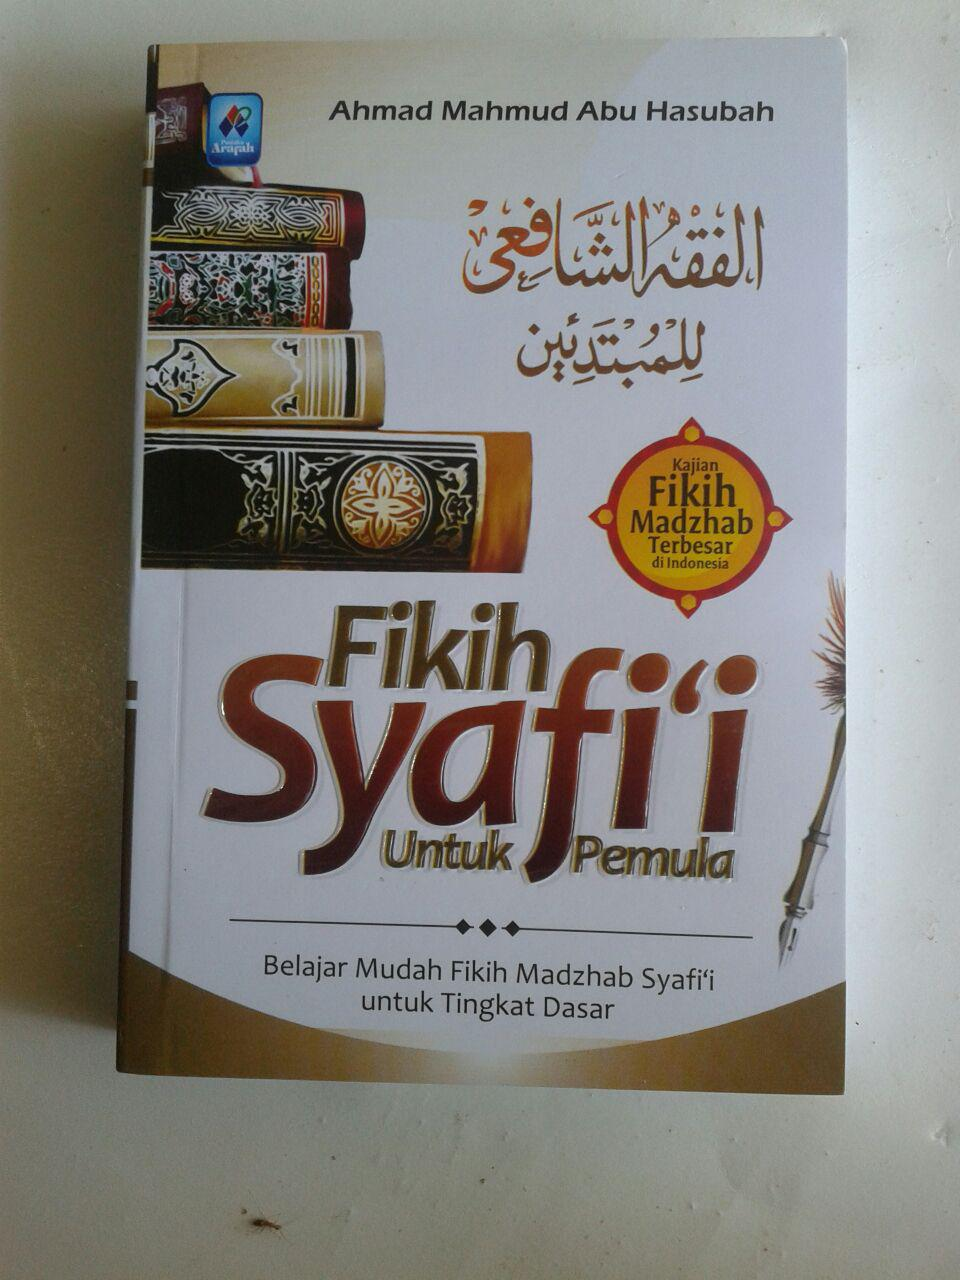 Buku Fikih Syafi'I Untuk Pemula Belajar Mudah Tingkat Dasar cover 2